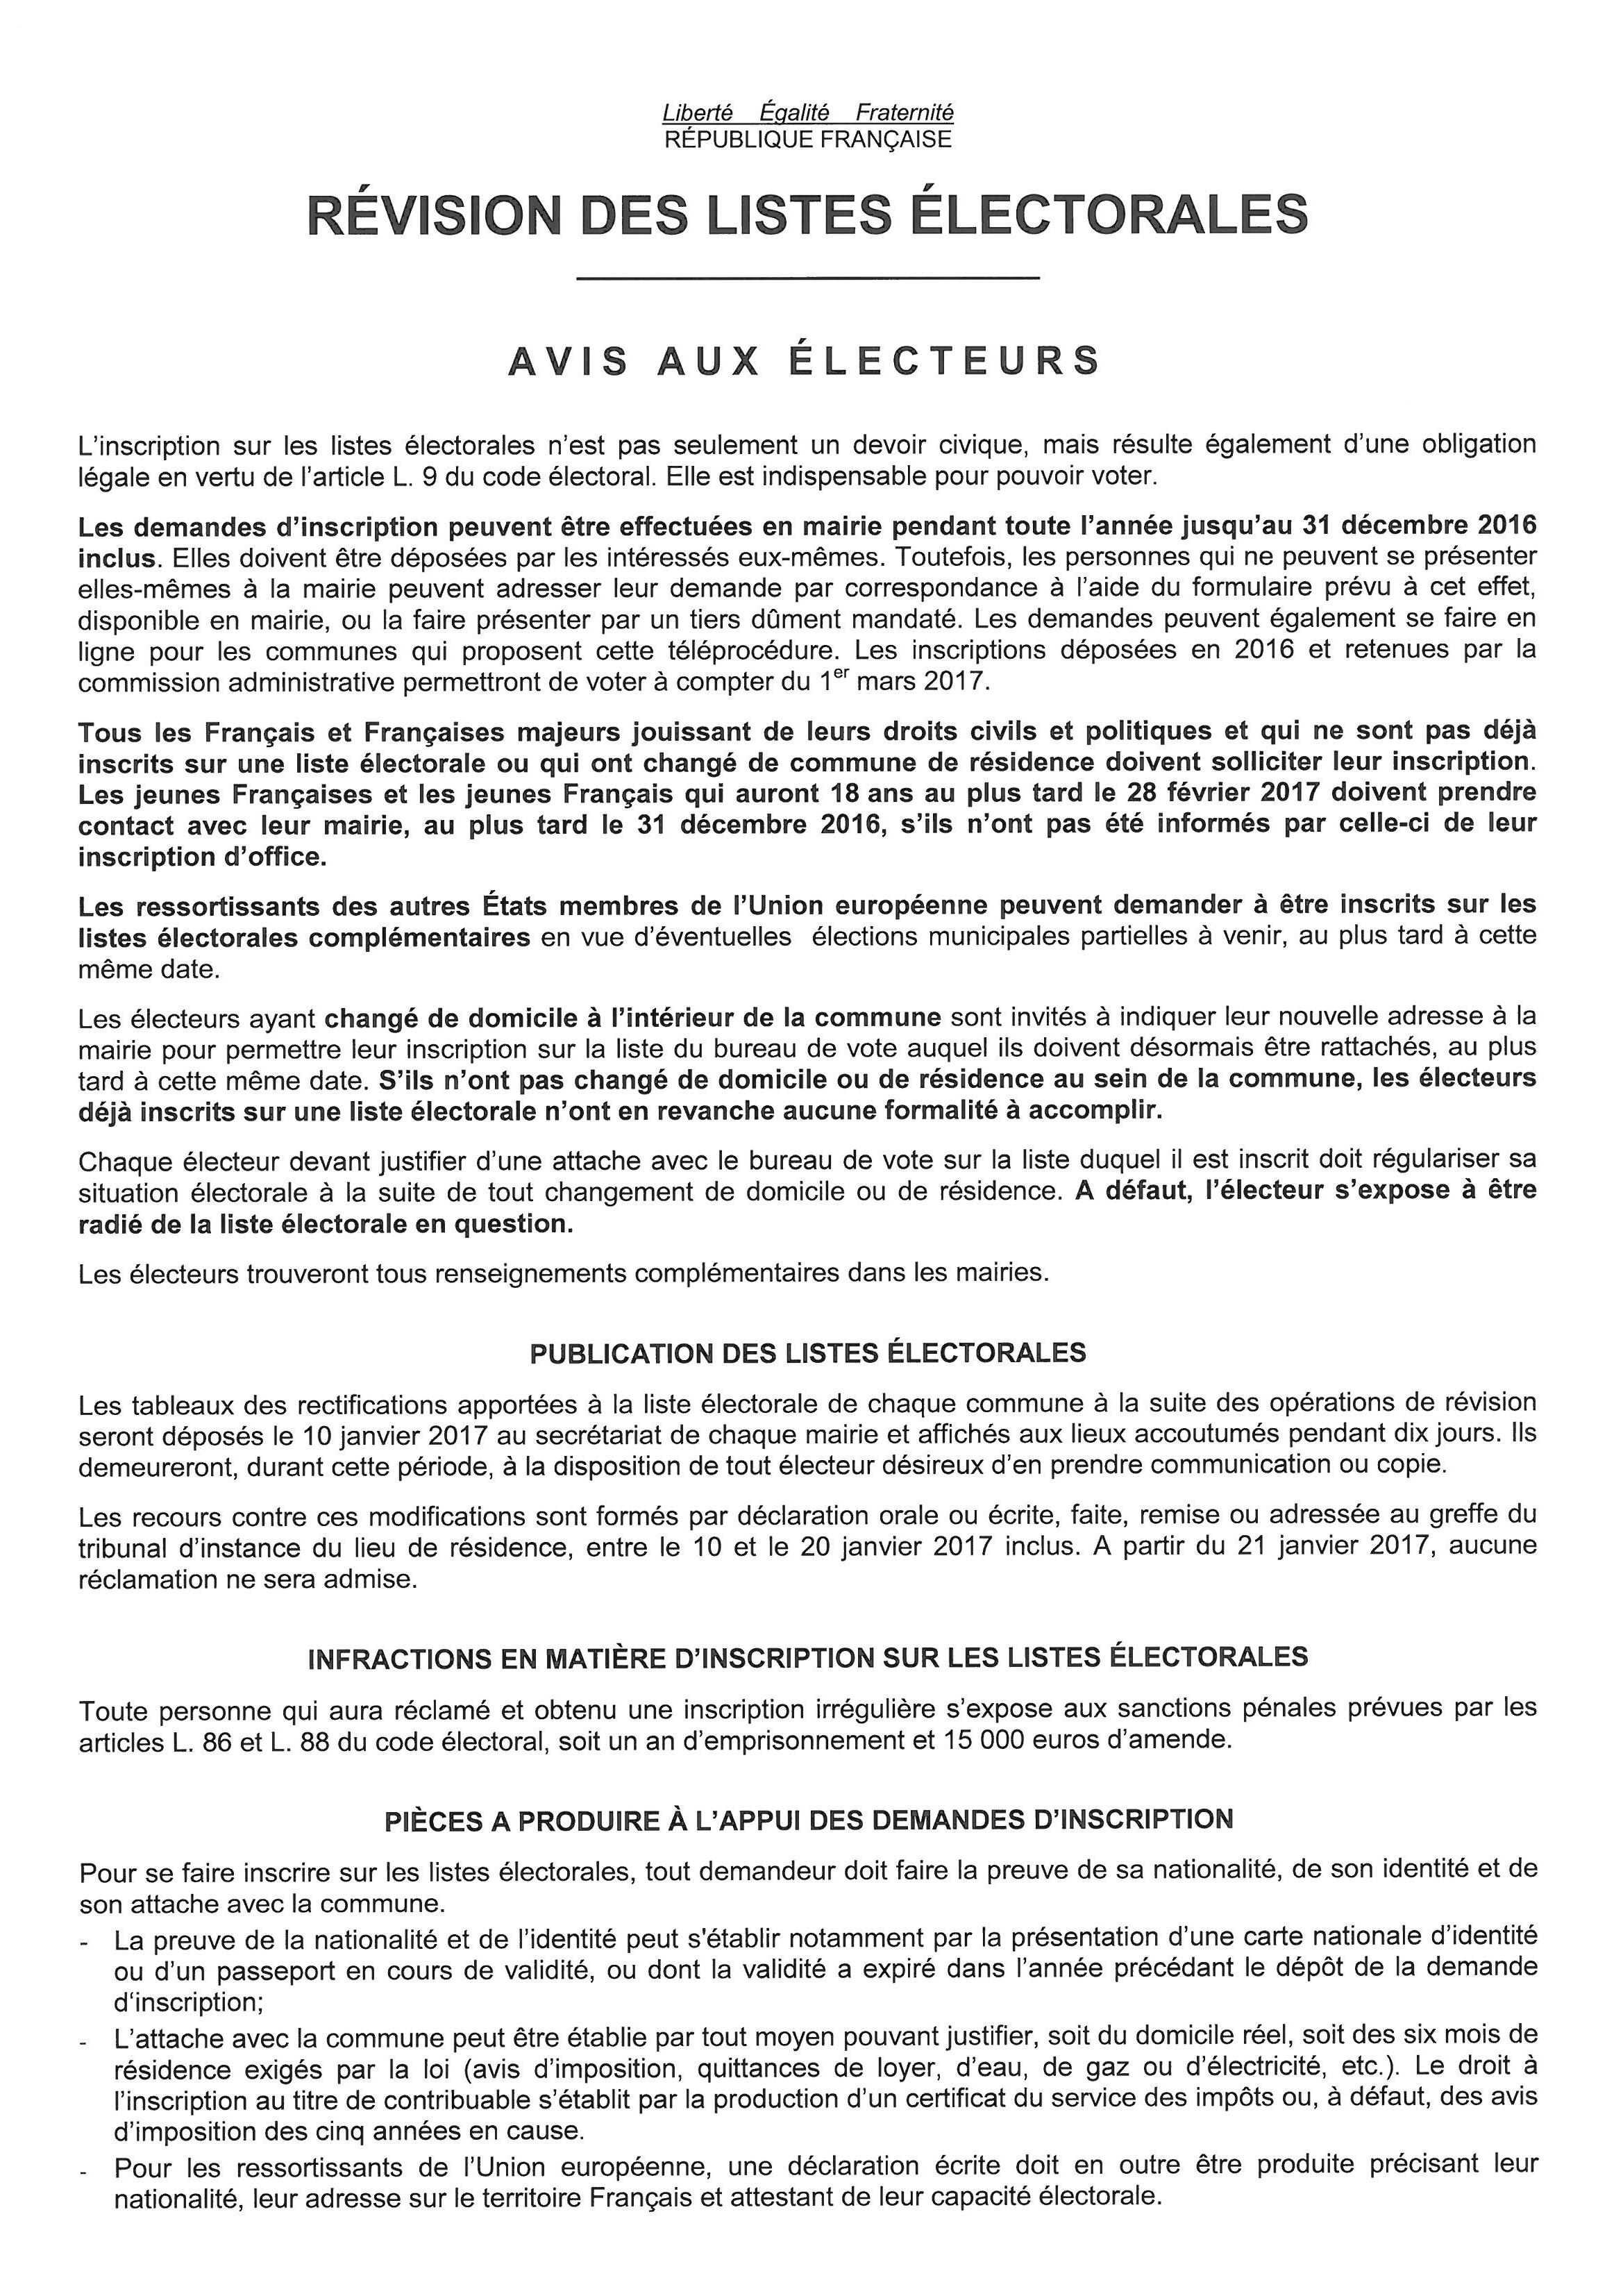 REVISION DES LISTES ELECTORALES